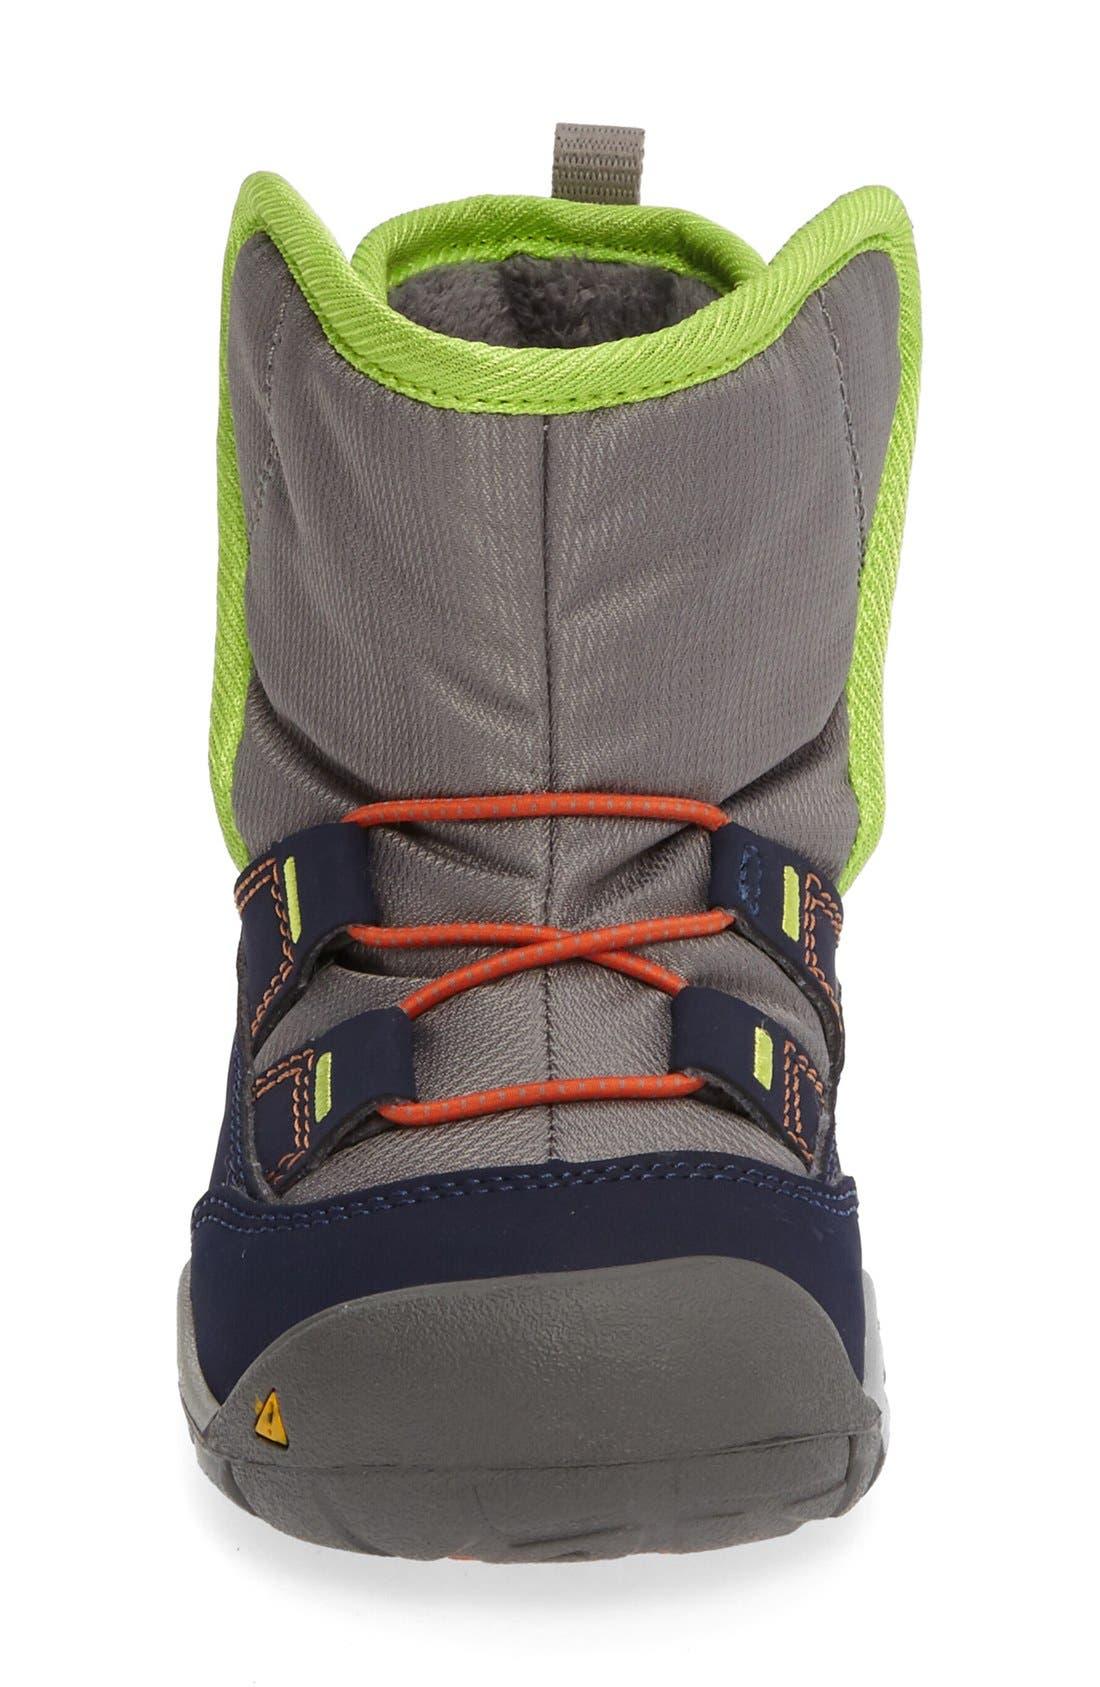 Alternate Image 3  - Keen Peek-A-Boot Fleece Lined Boot (Baby & Walker)